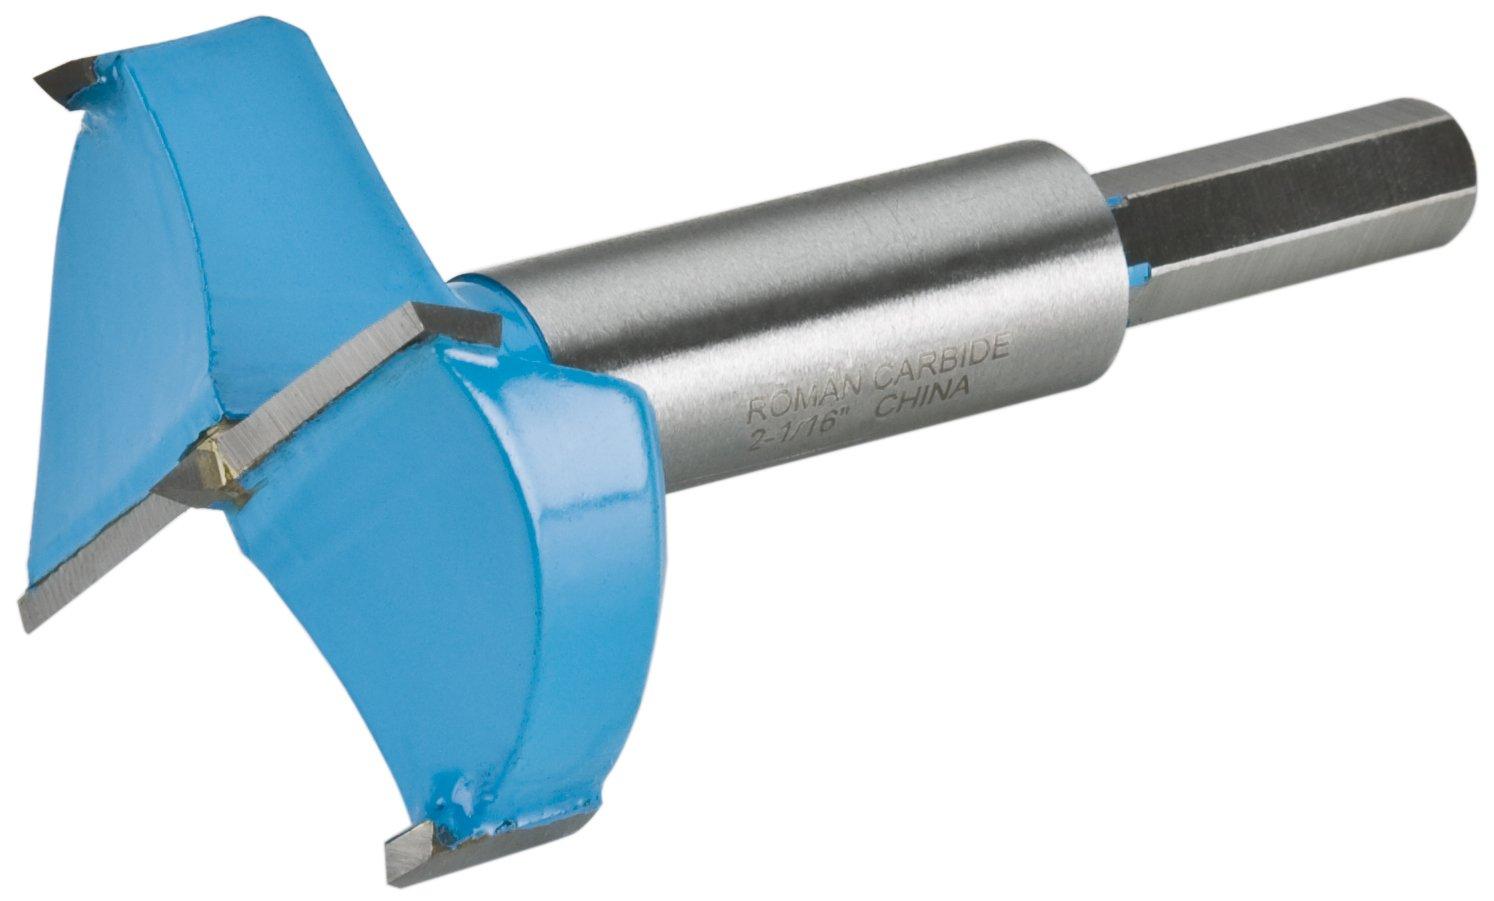 18mm Roman Carbide DC1892 Carbide Forstner Bit